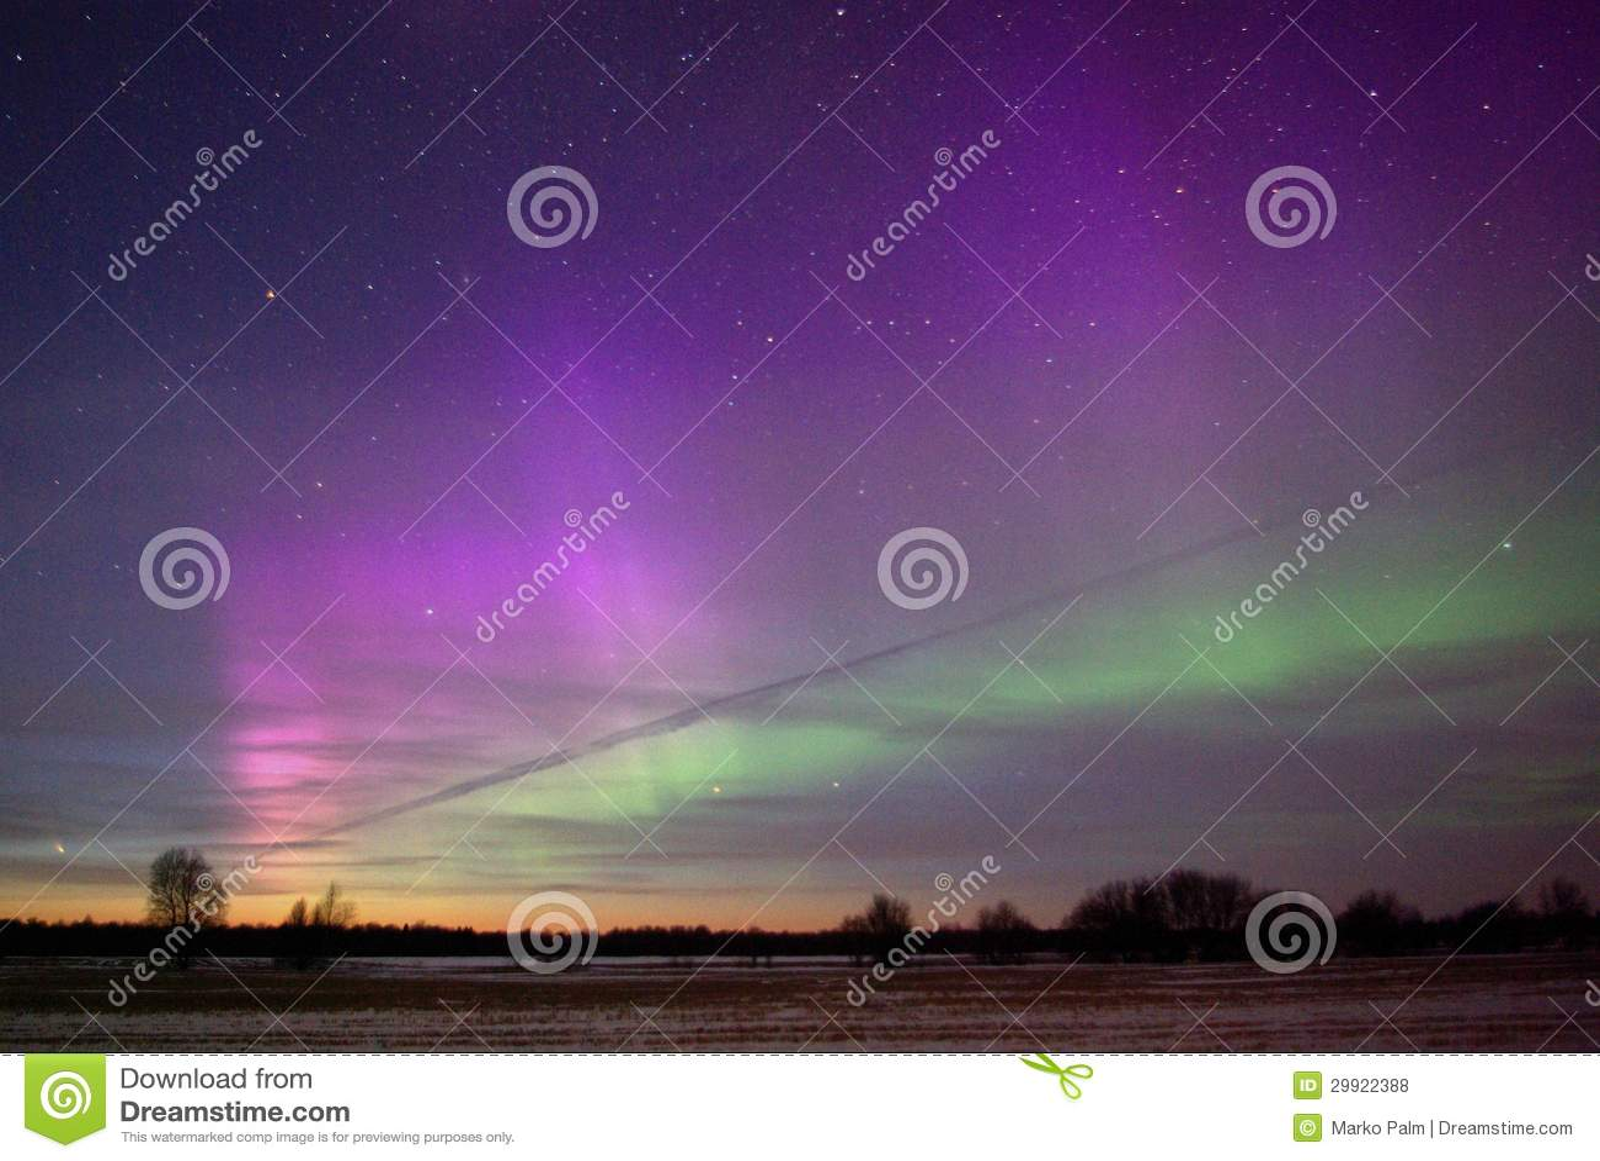 northern lights comet - photo #32